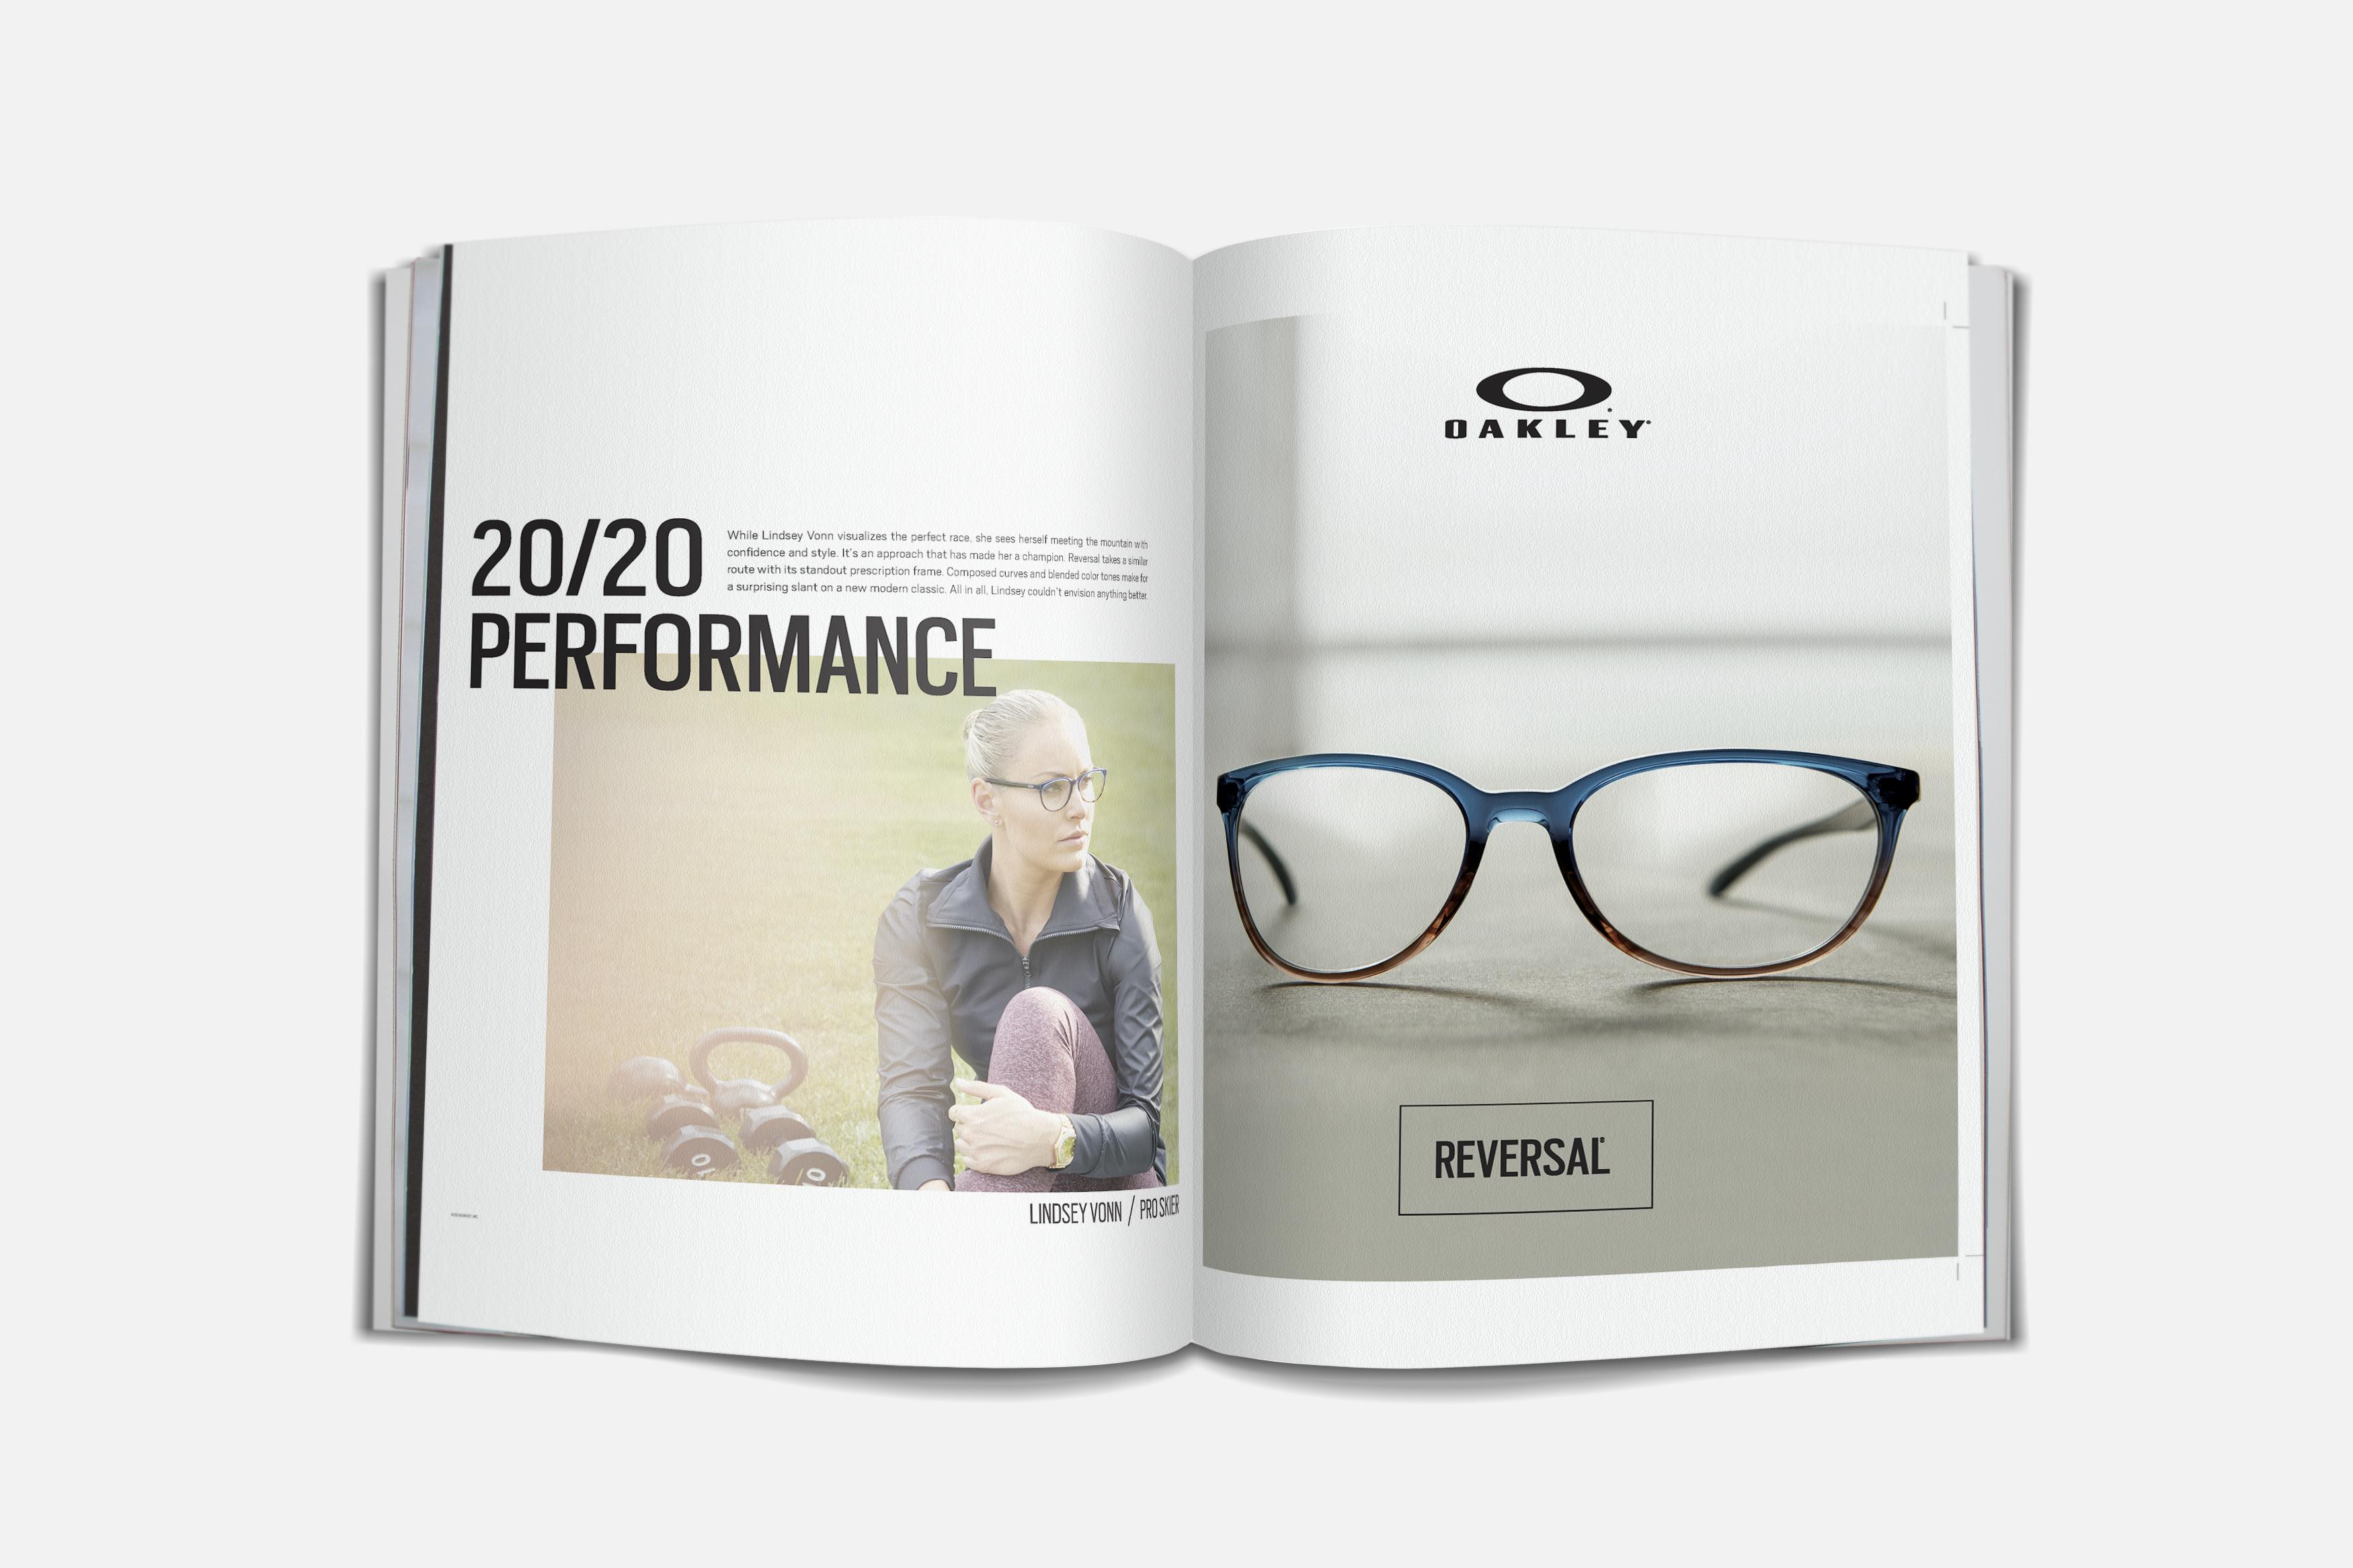 2020performance